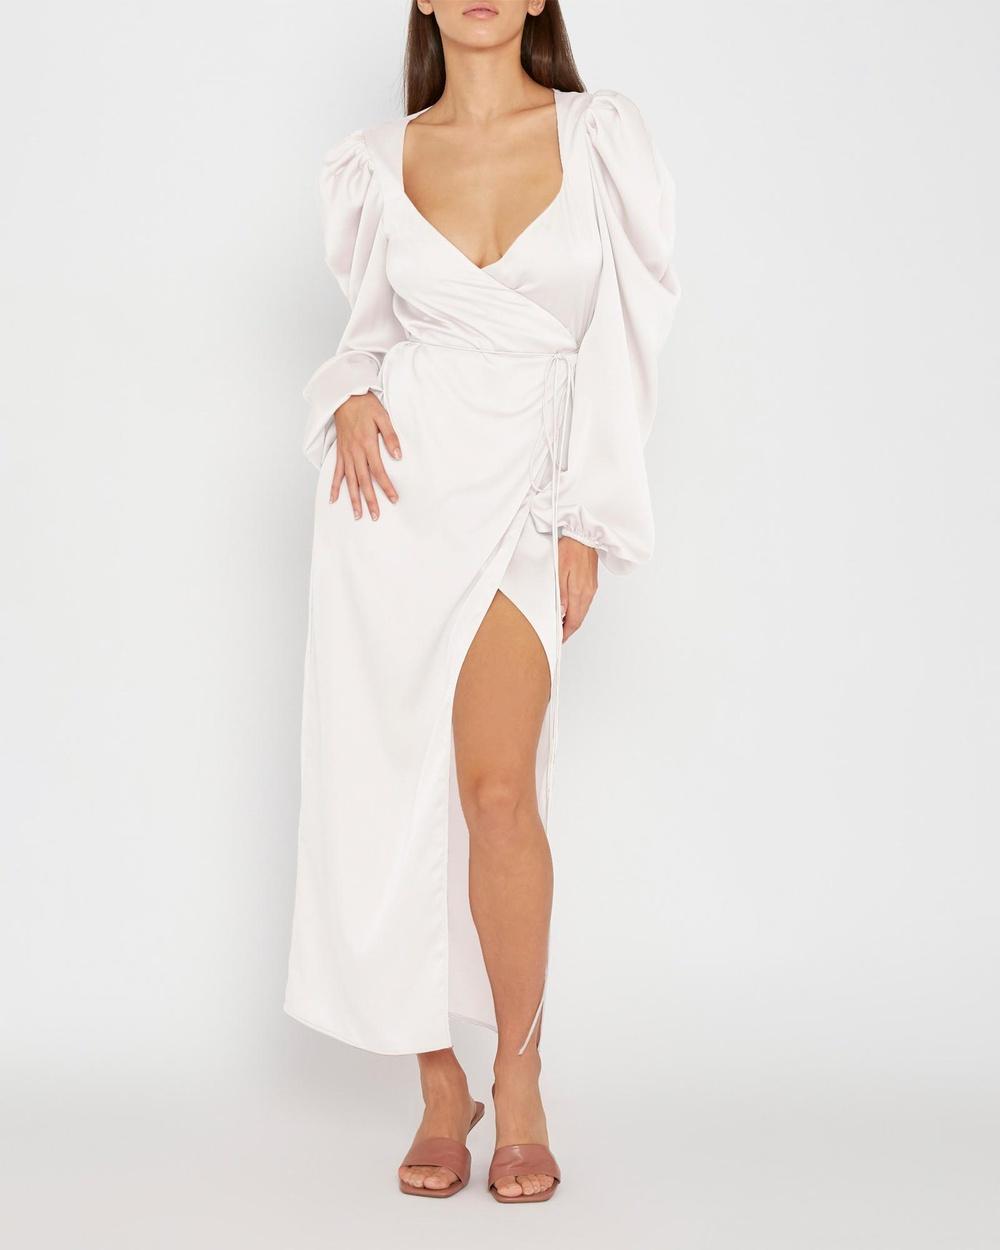 BY JOHNNY. Luna Robe Dress Bridesmaid Dresses White Australia